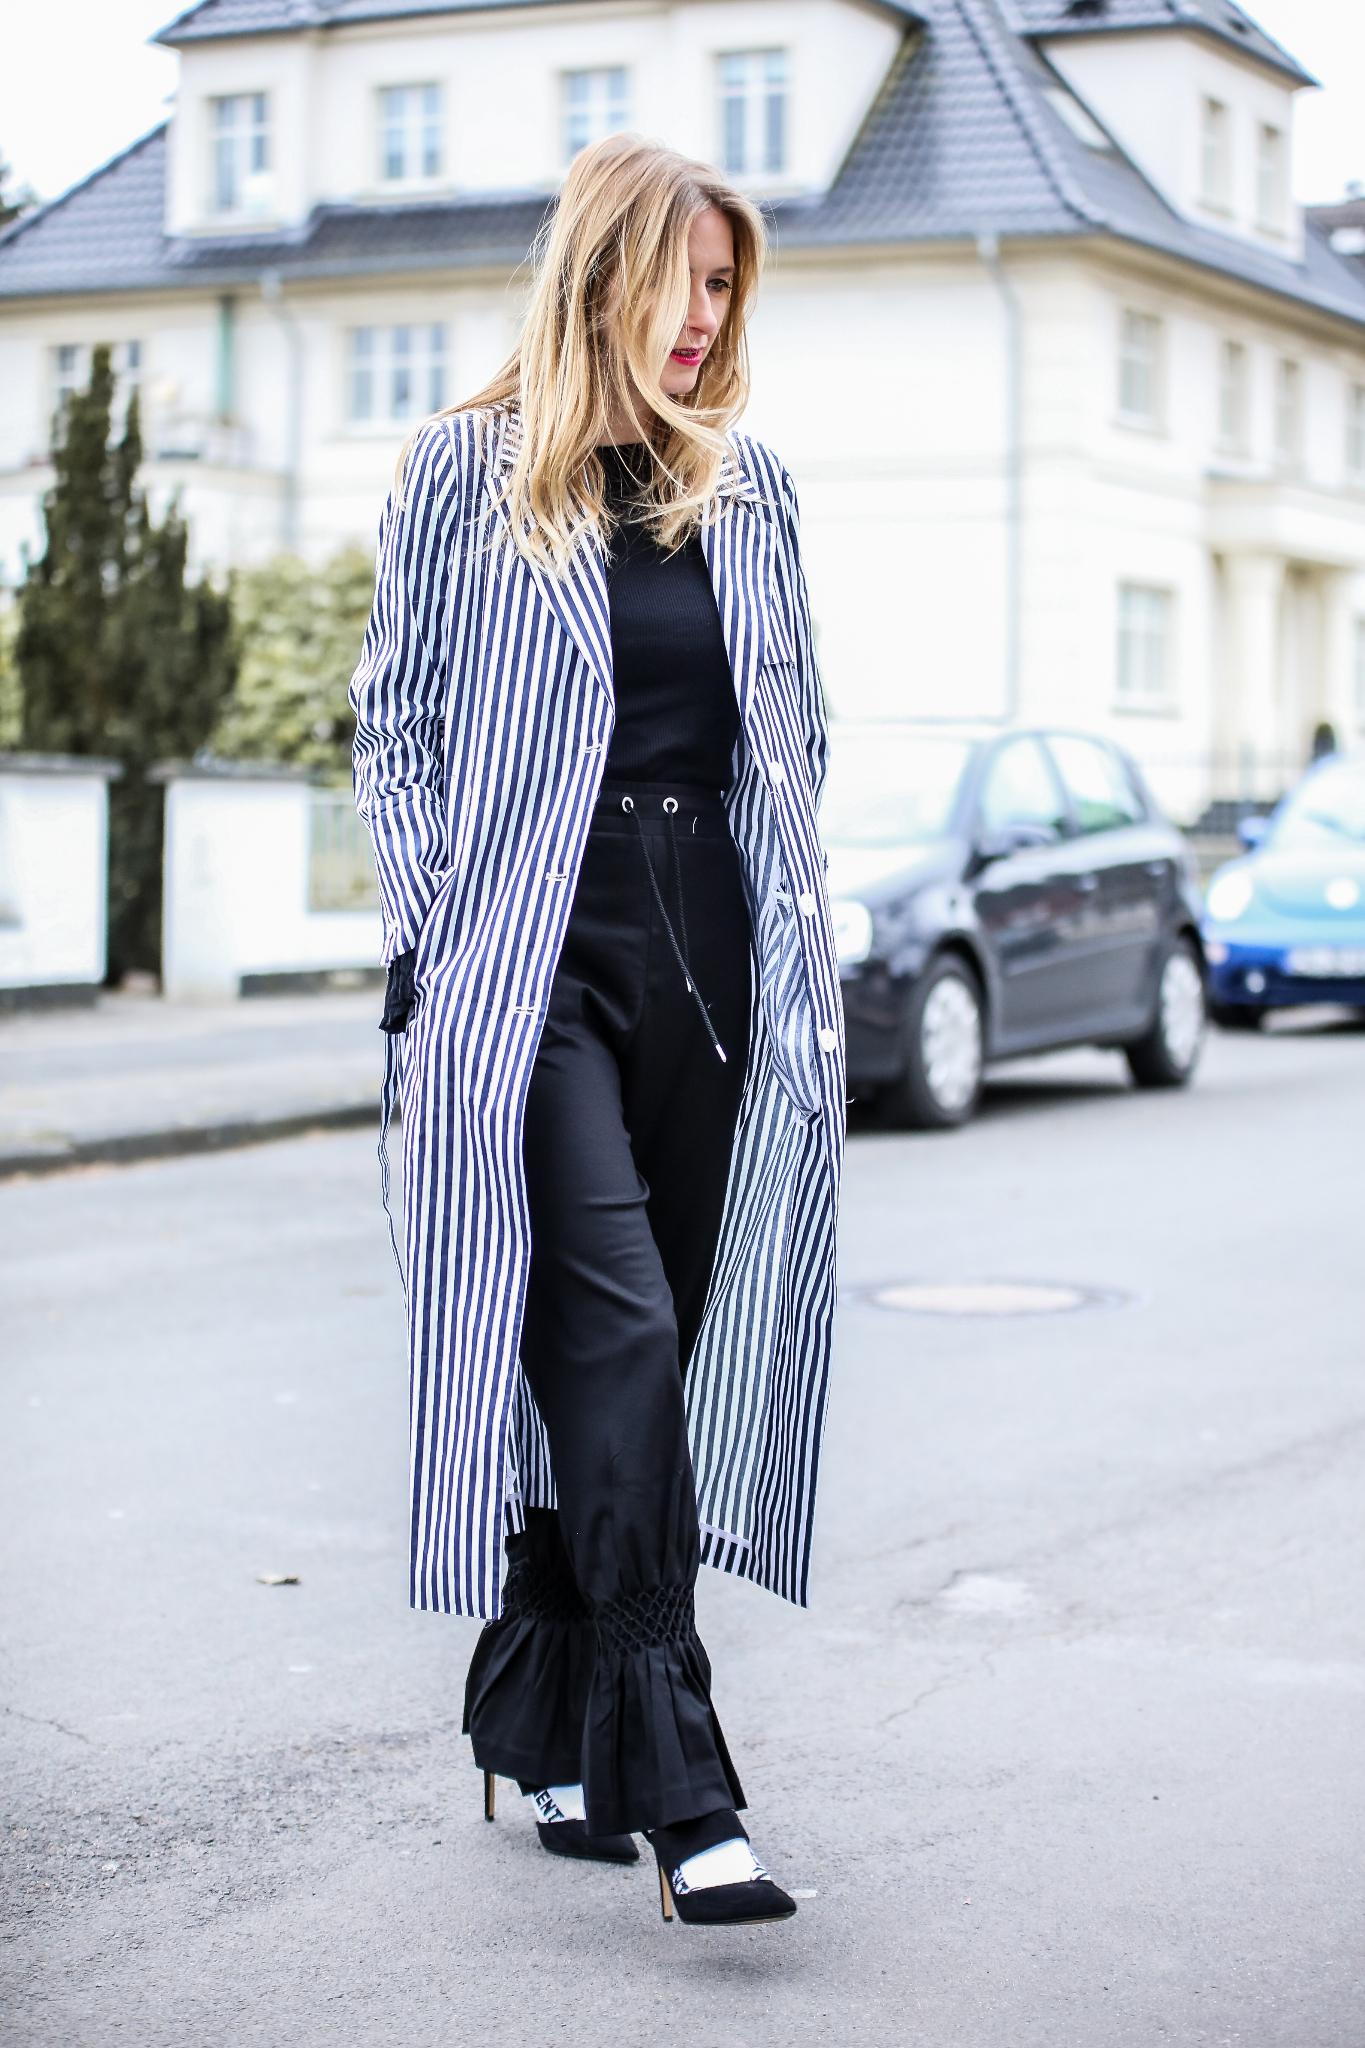 MOD-by-Monique-Fashion-Looks-Striped-Coat-Big-Volants-5